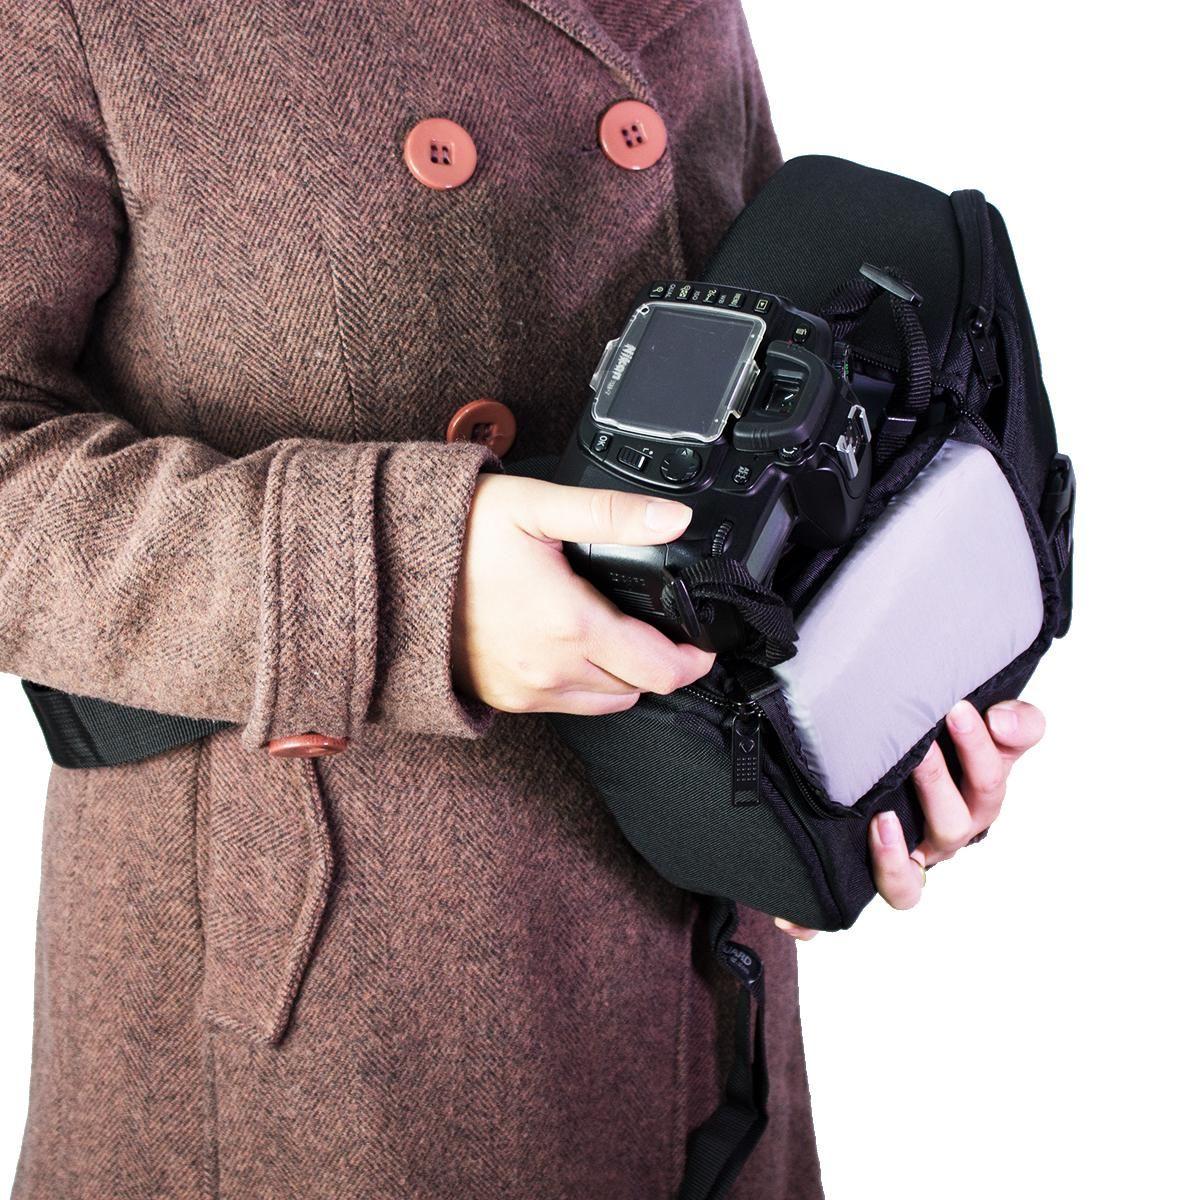 Mochila Vanguard Ziin 37bk para Equipamentos Fotográficos